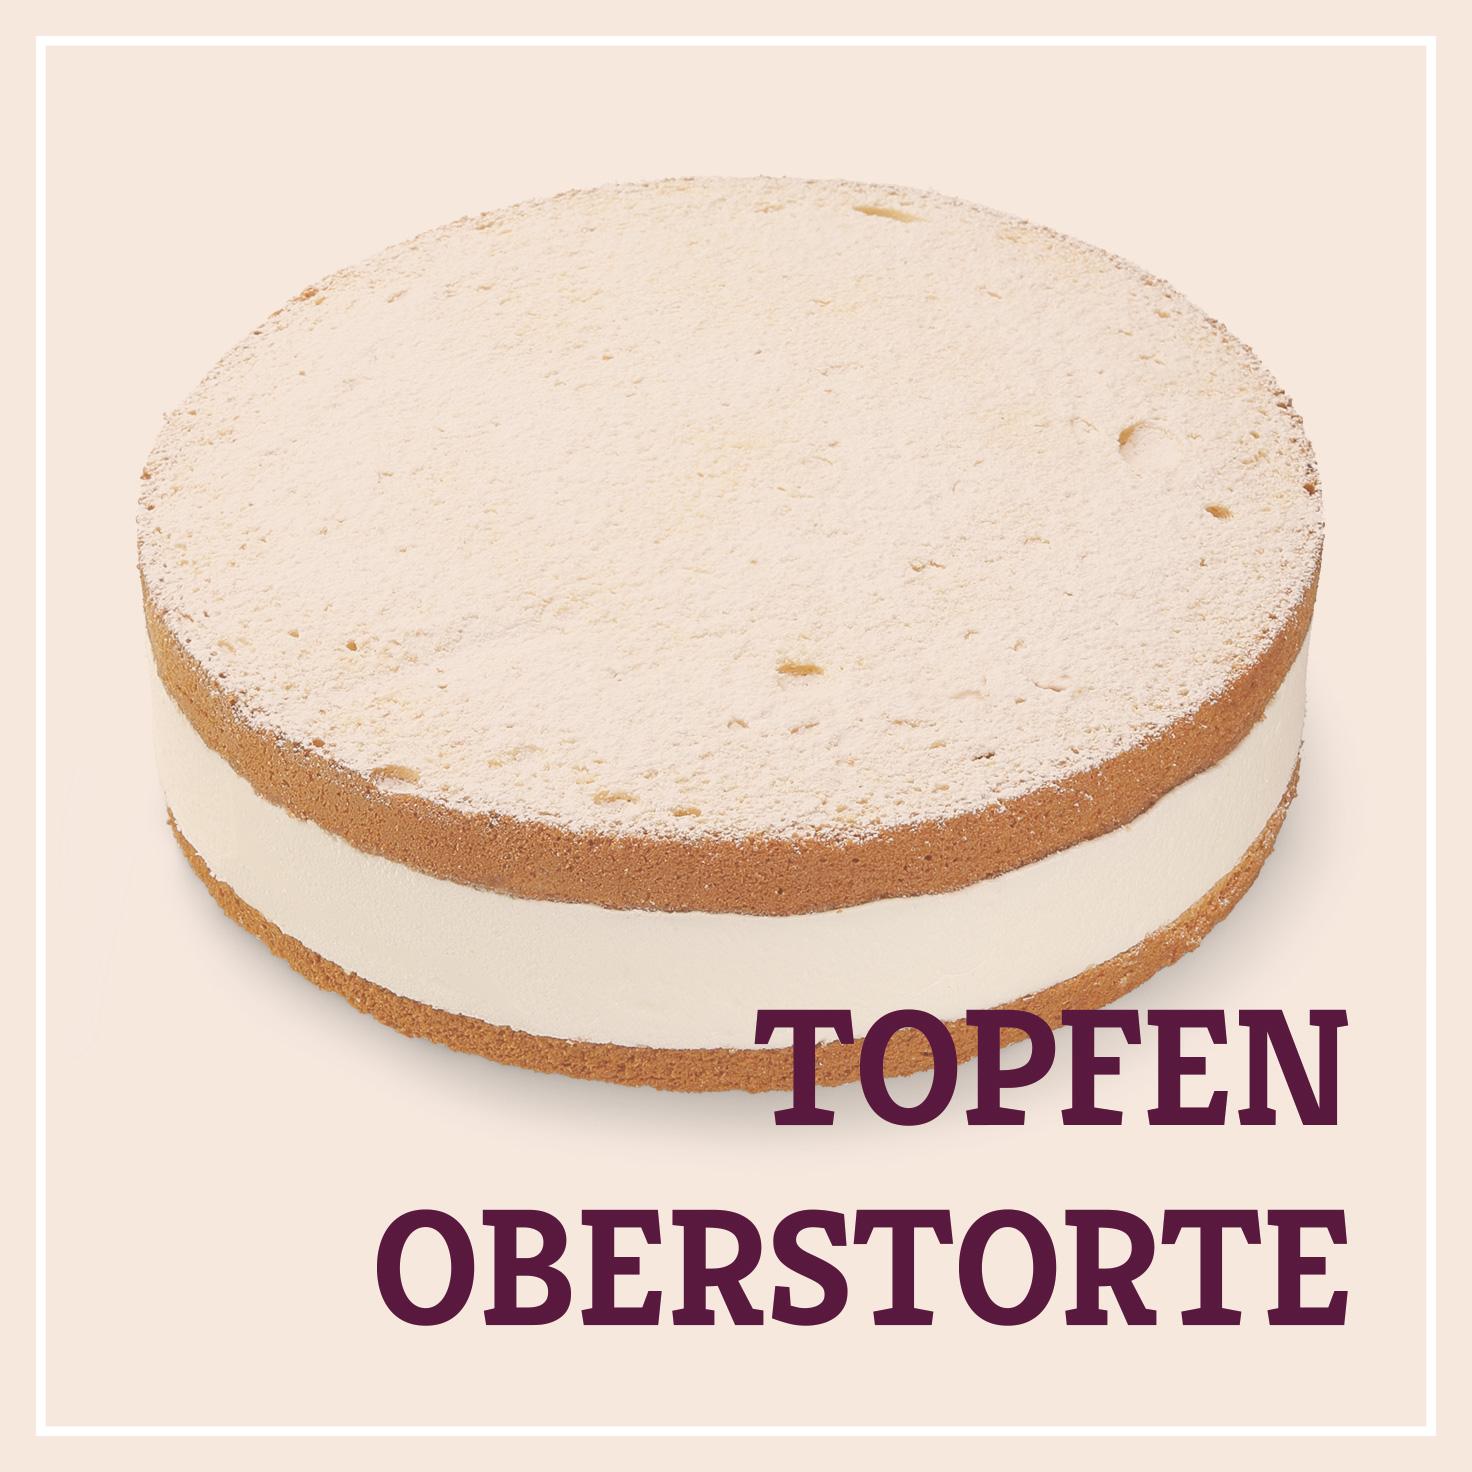 Heiss & Süß - Topfen-Oberstorte